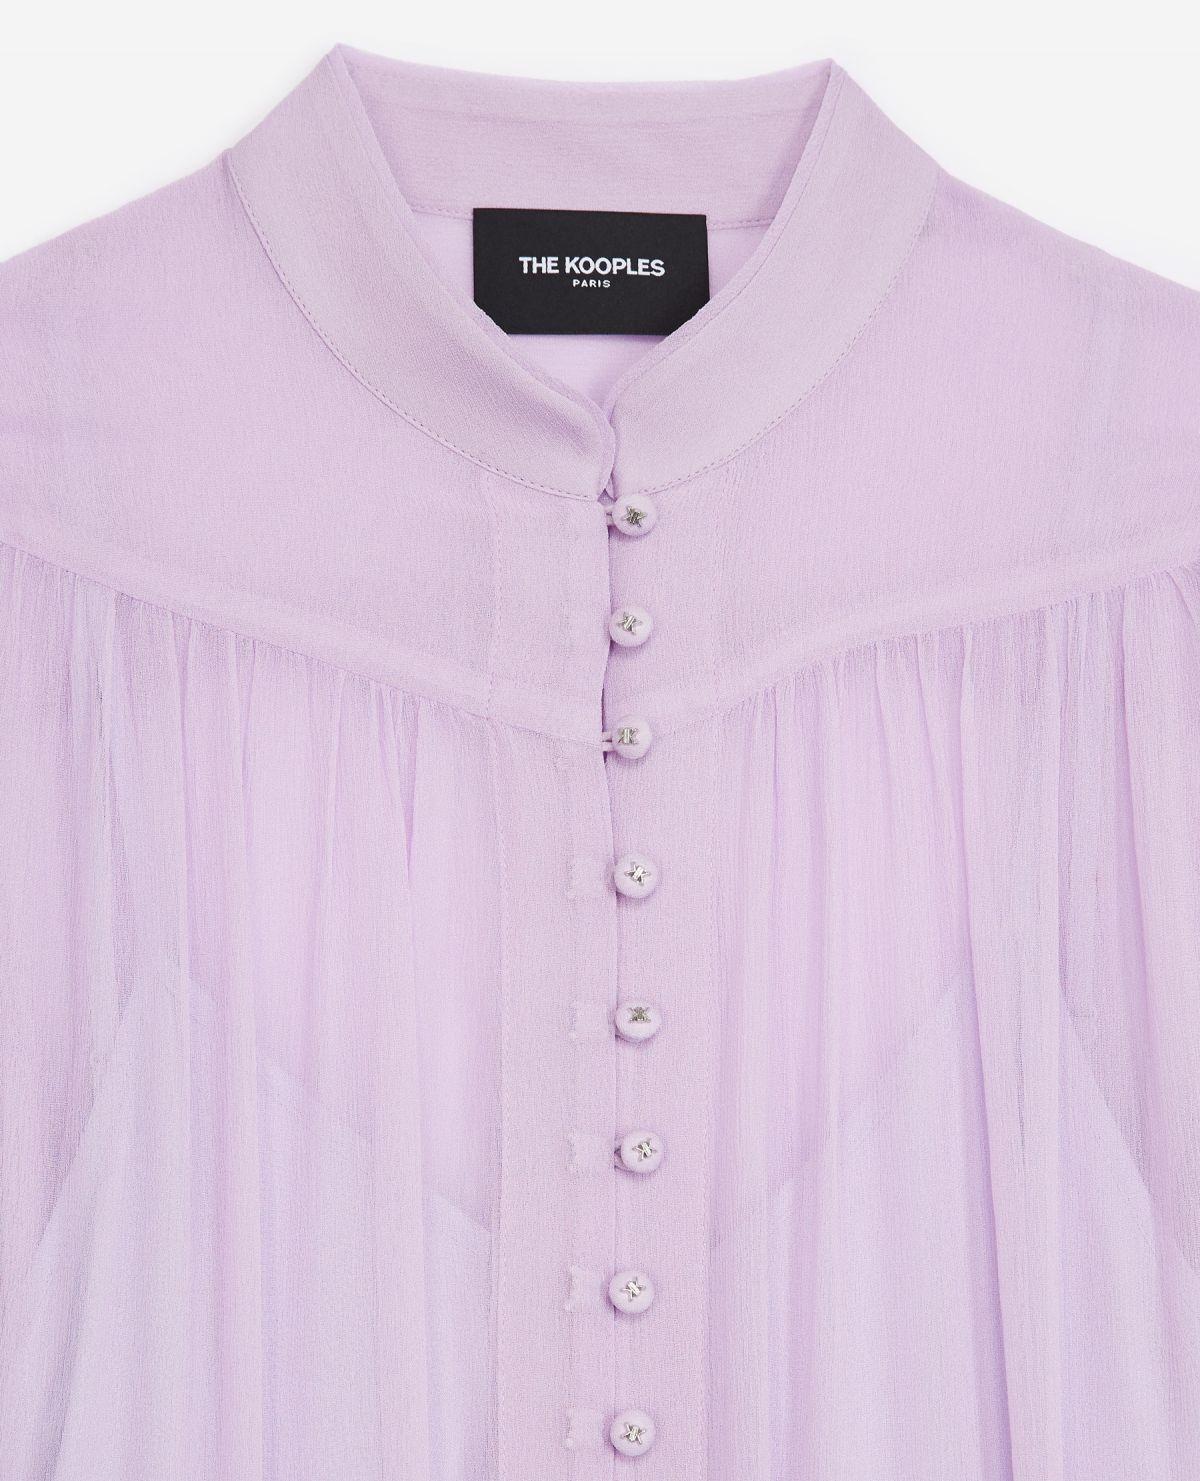 THE KOOPLES robe longue ceinturee-3